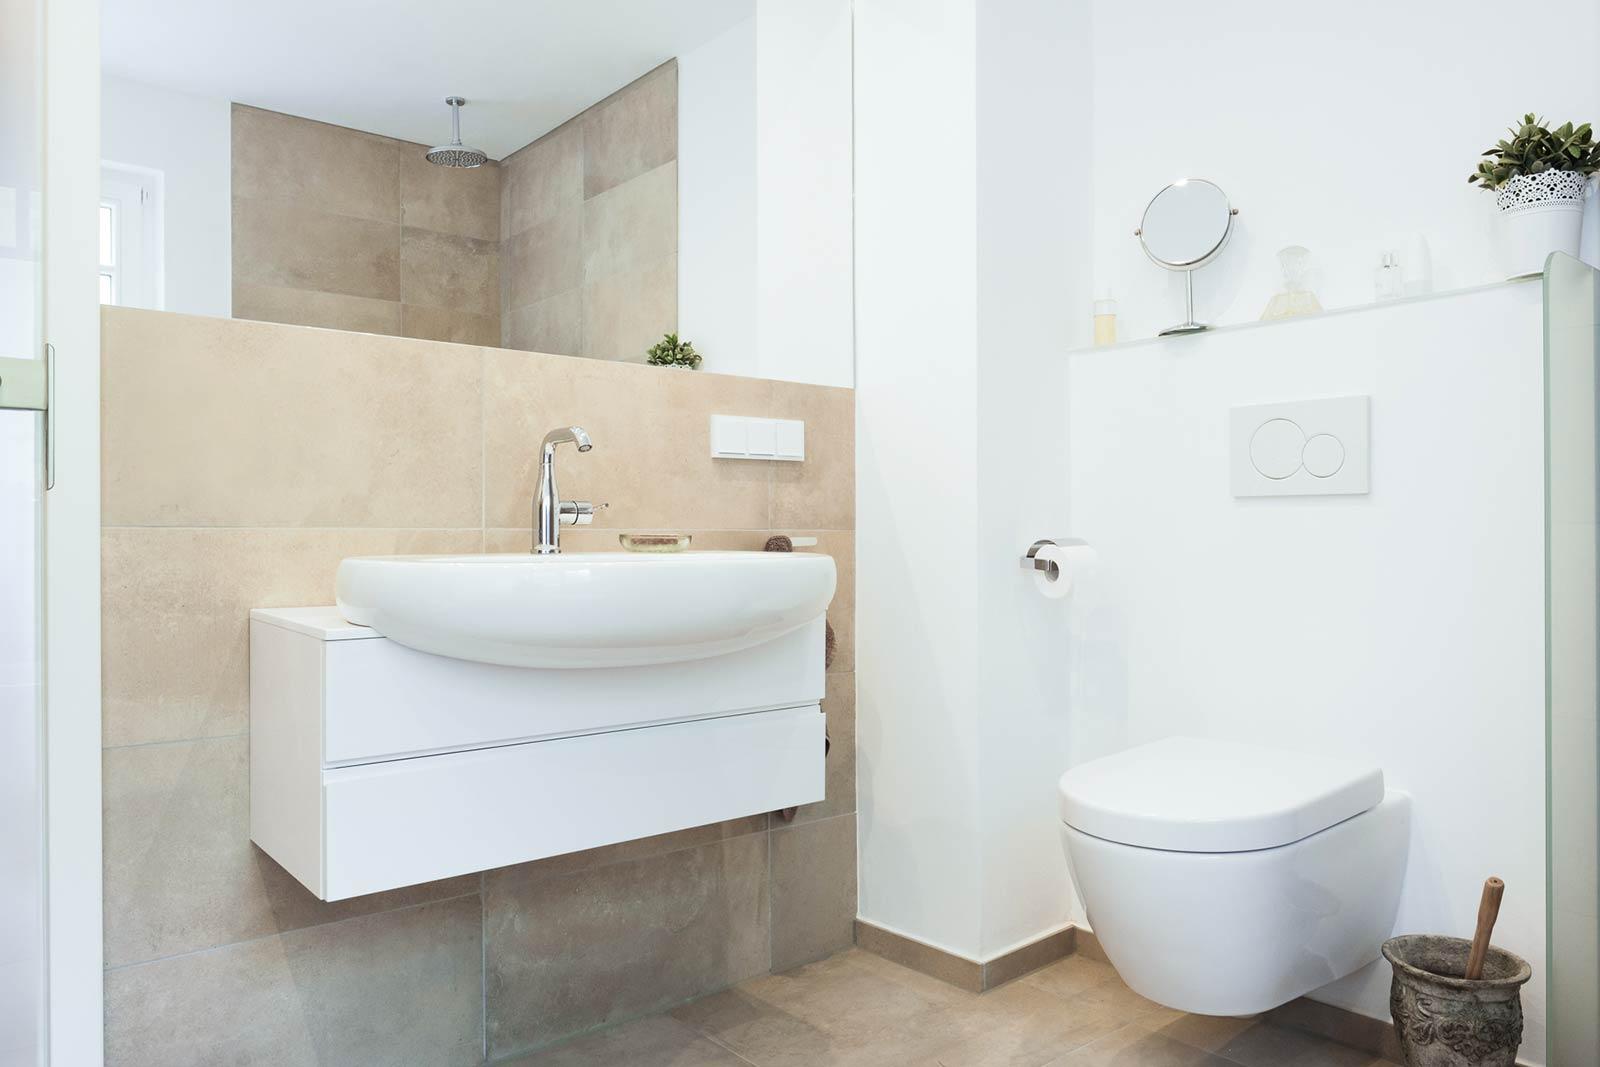 Badezimer sauber